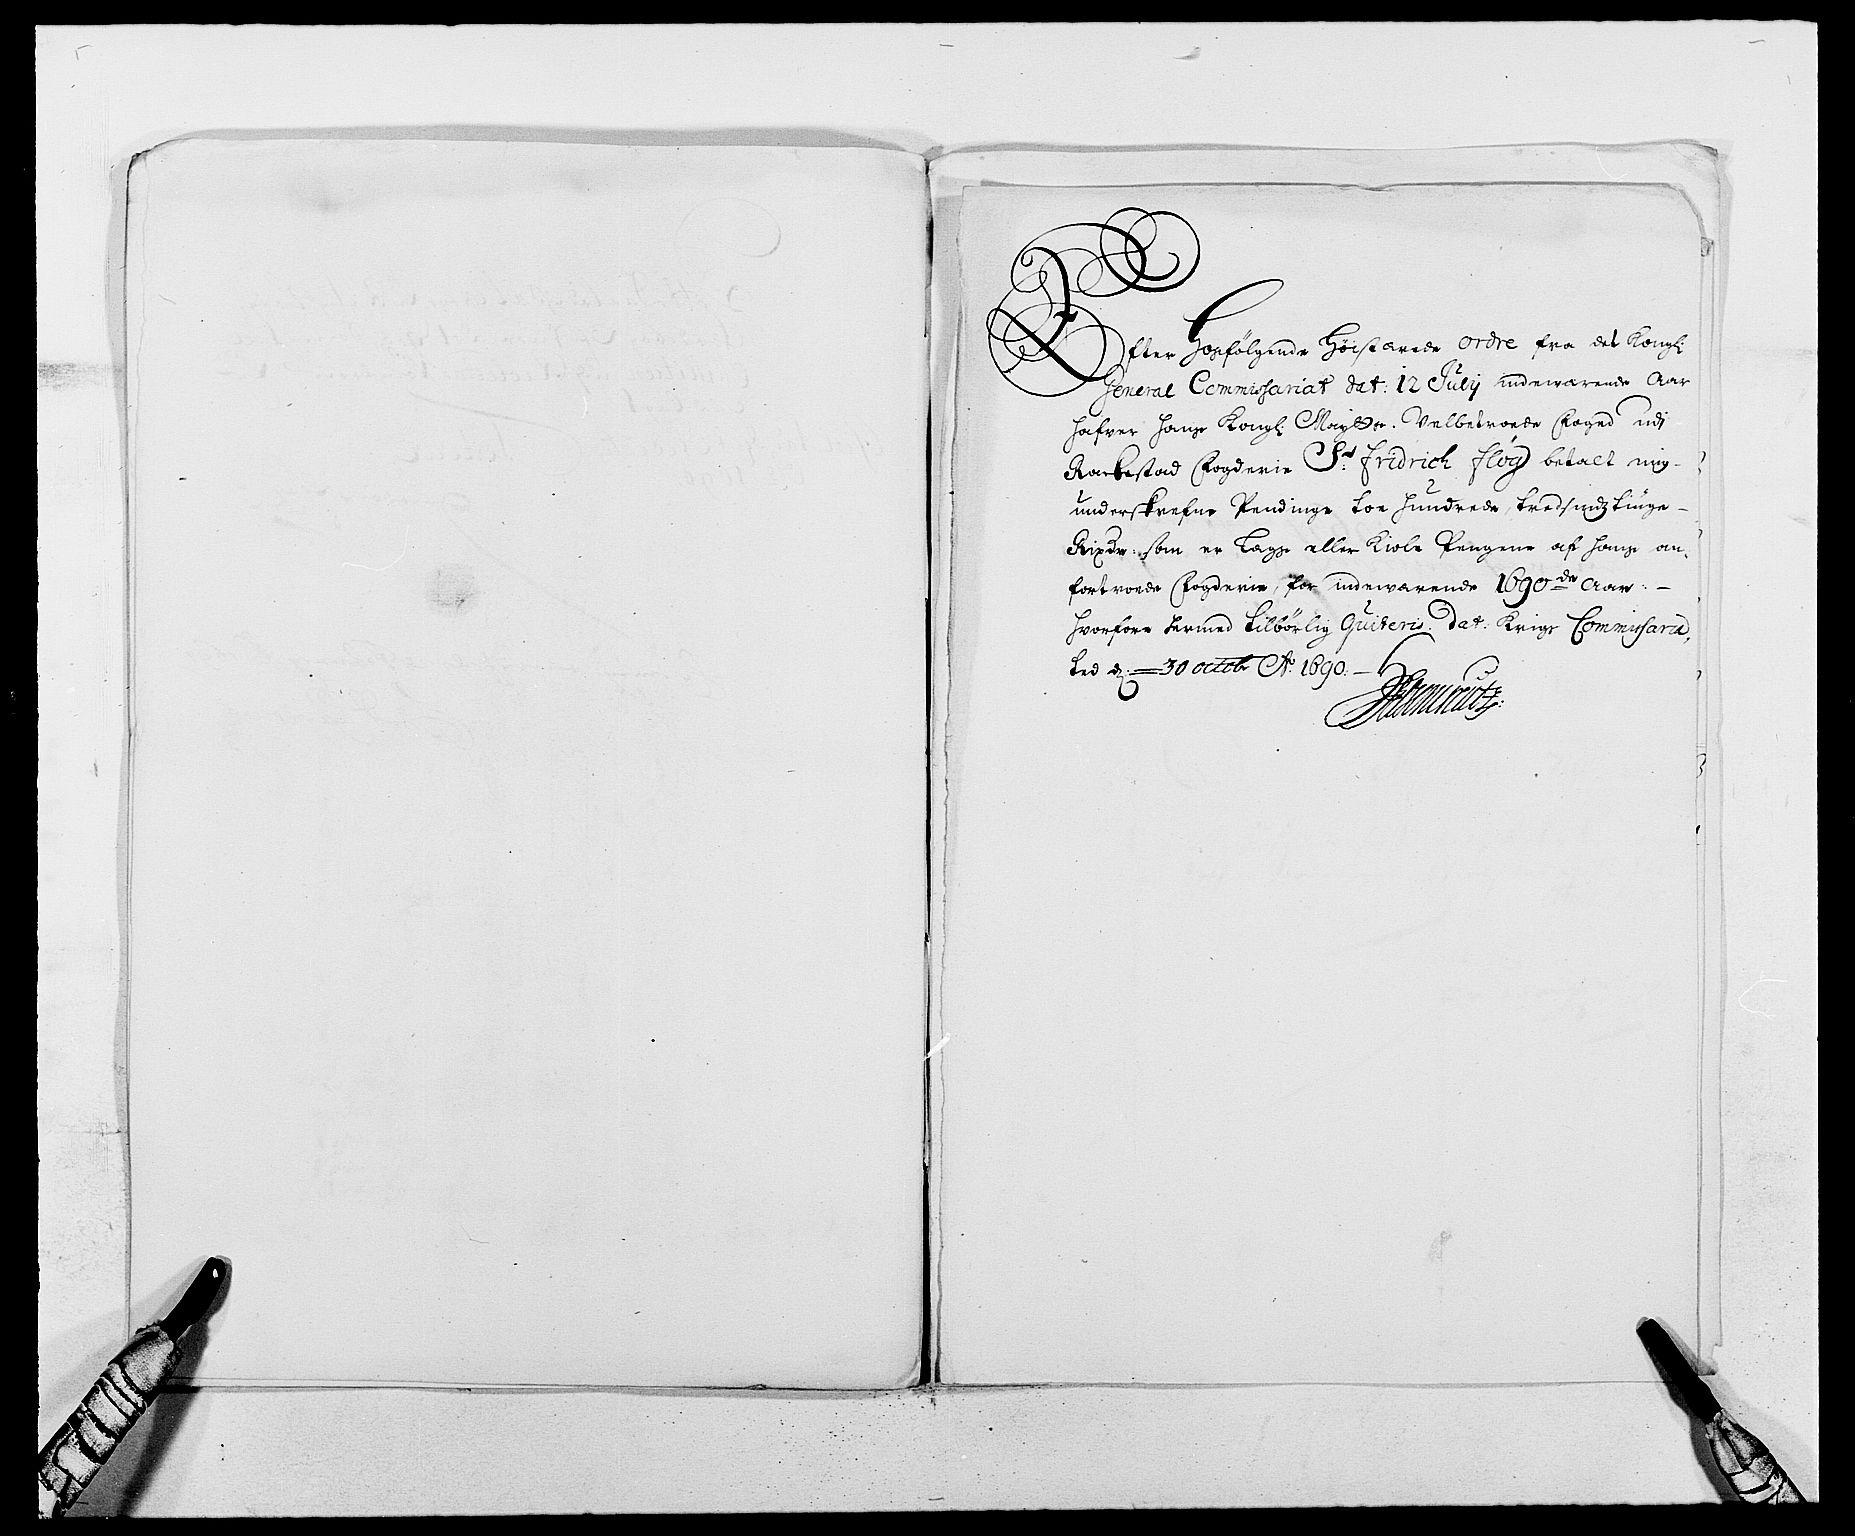 RA, Rentekammeret inntil 1814, Reviderte regnskaper, Fogderegnskap, R05/L0277: Fogderegnskap Rakkestad, 1689-1690, s. 363